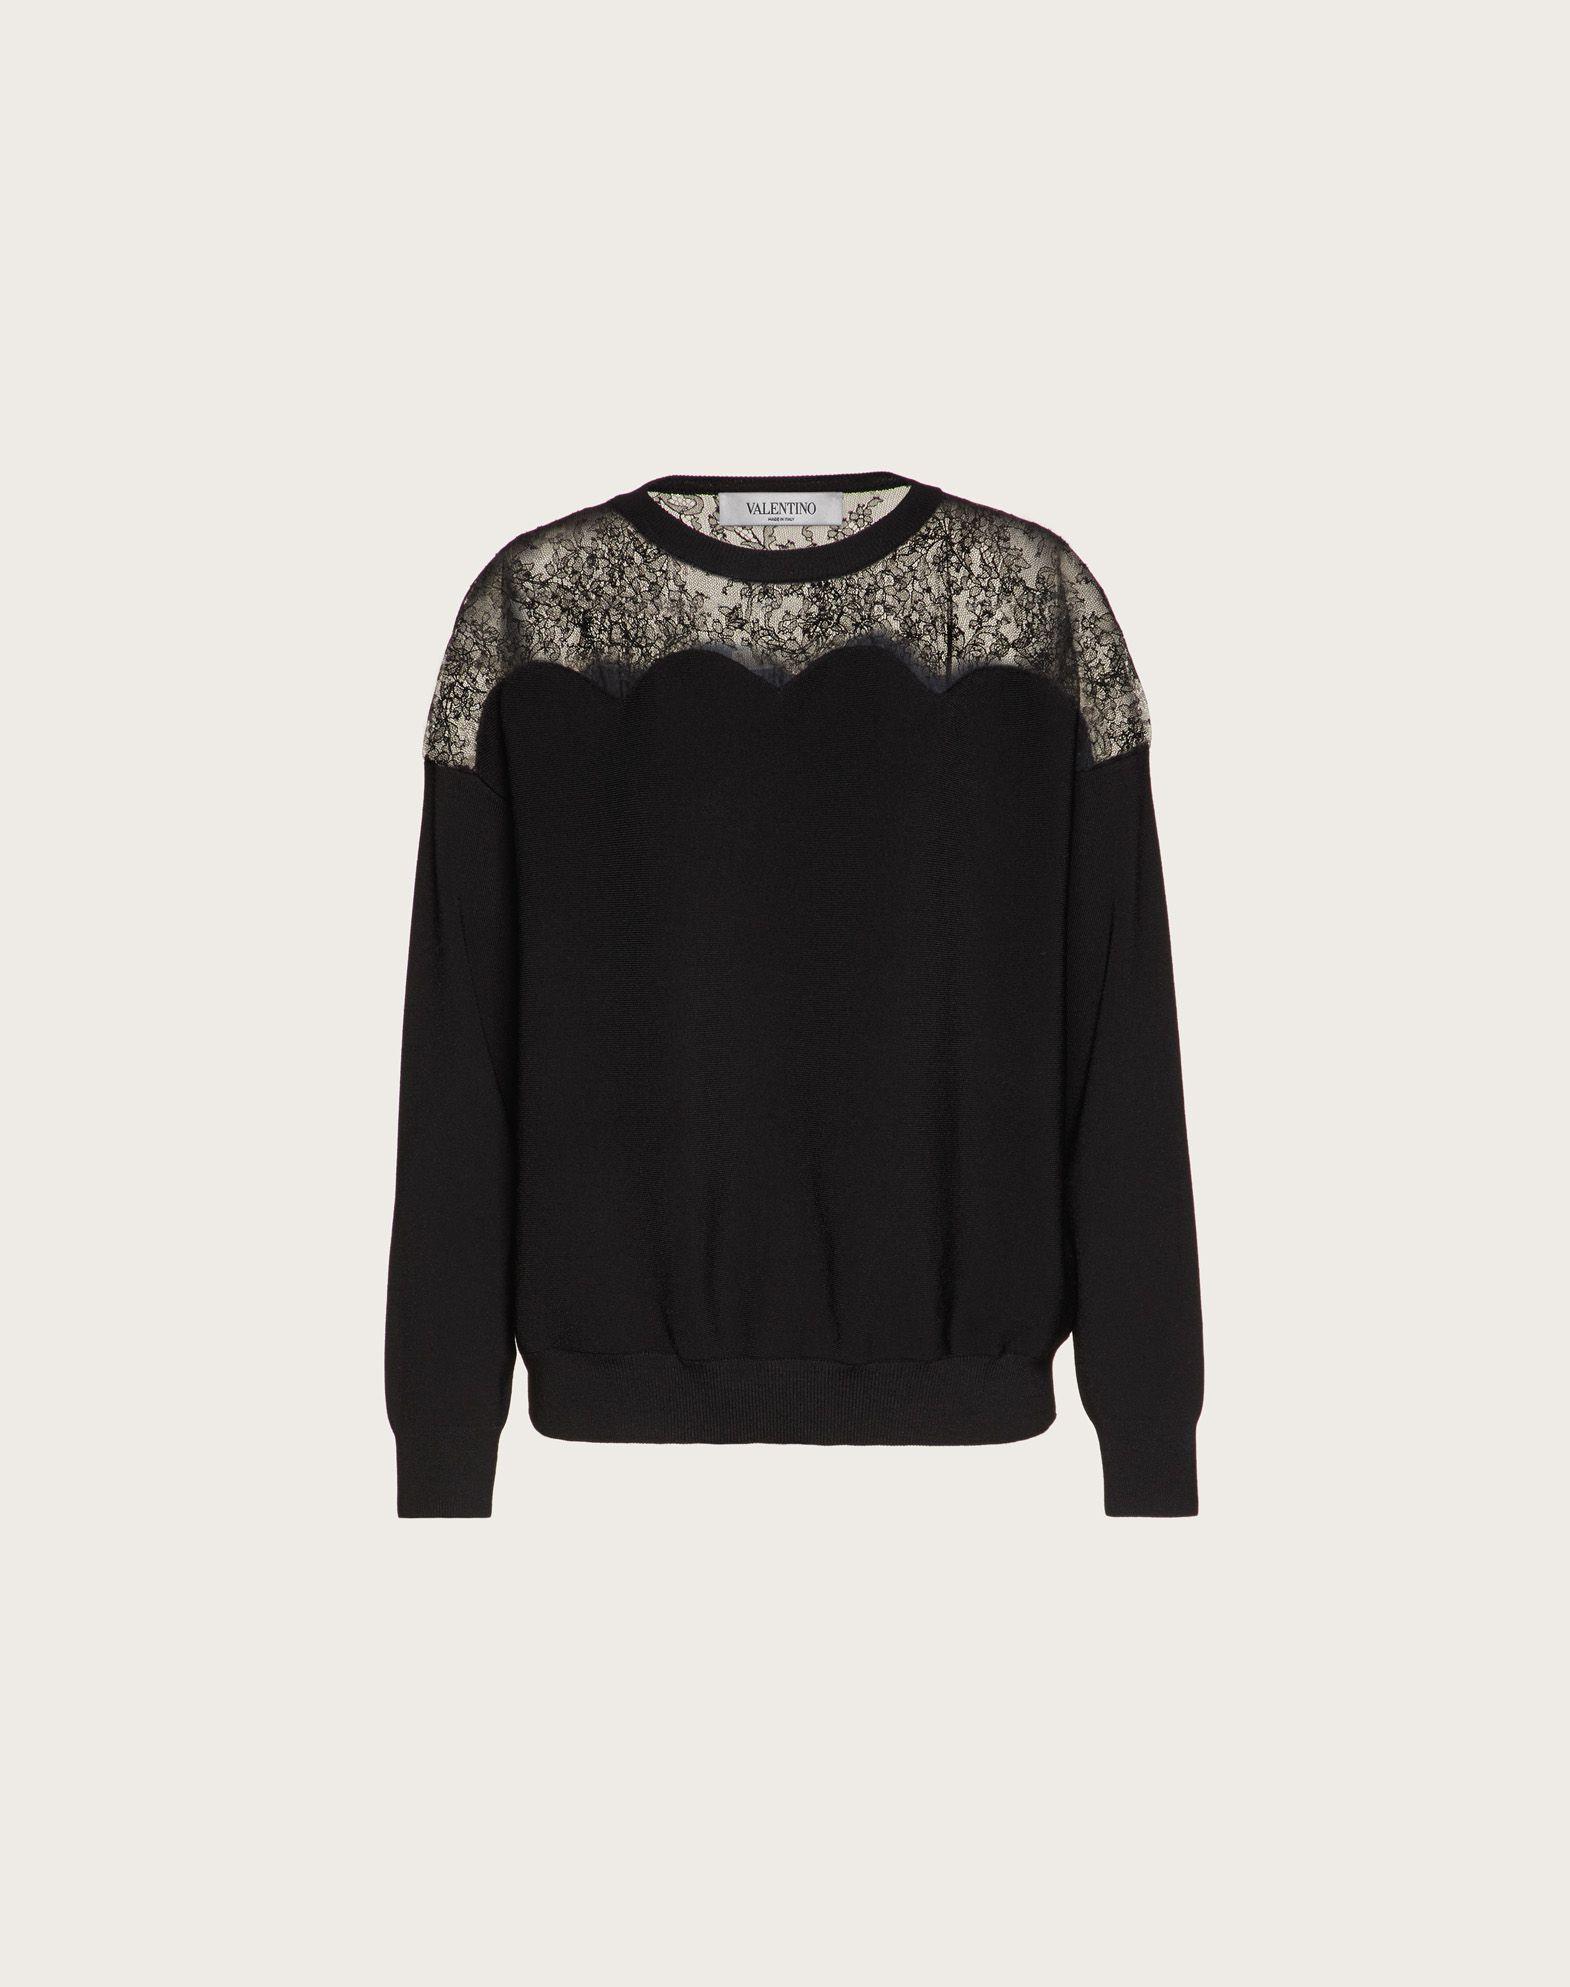 Stretch Viscose and Lace Sweater